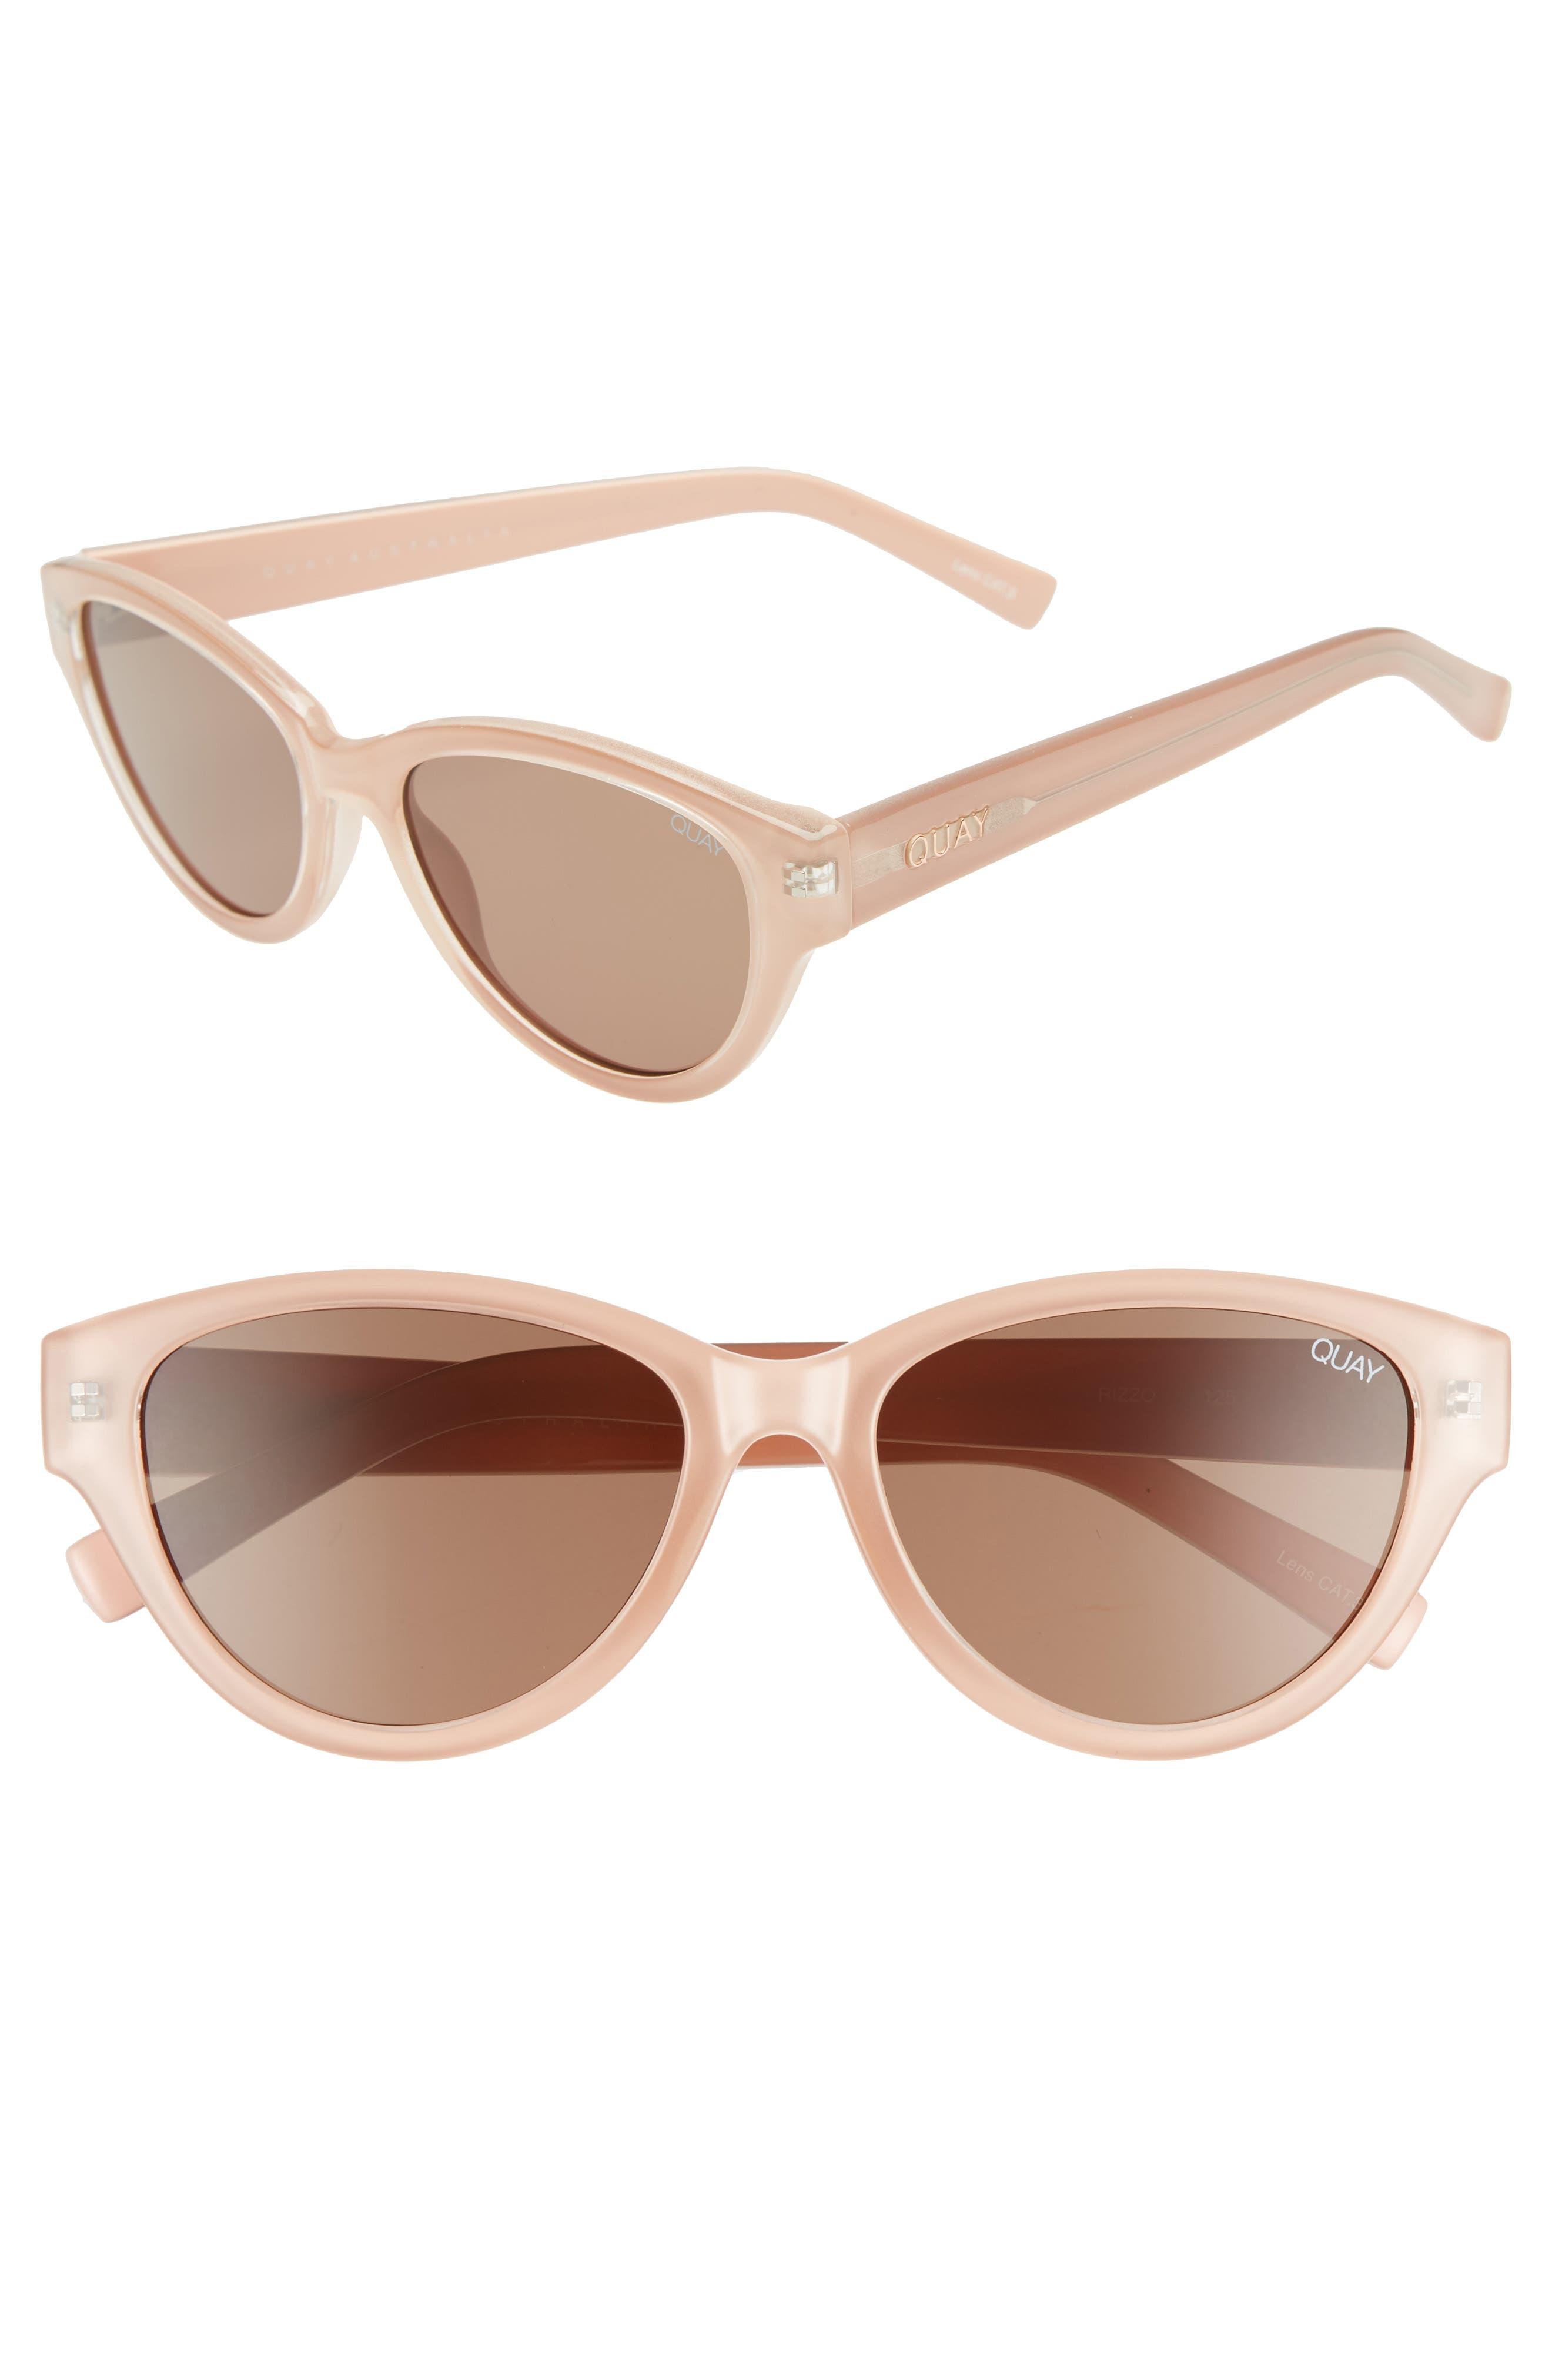 Rizzo 55mm Cat Eye Sunglasses,                         Main,                         color, CREAM/ BROWN